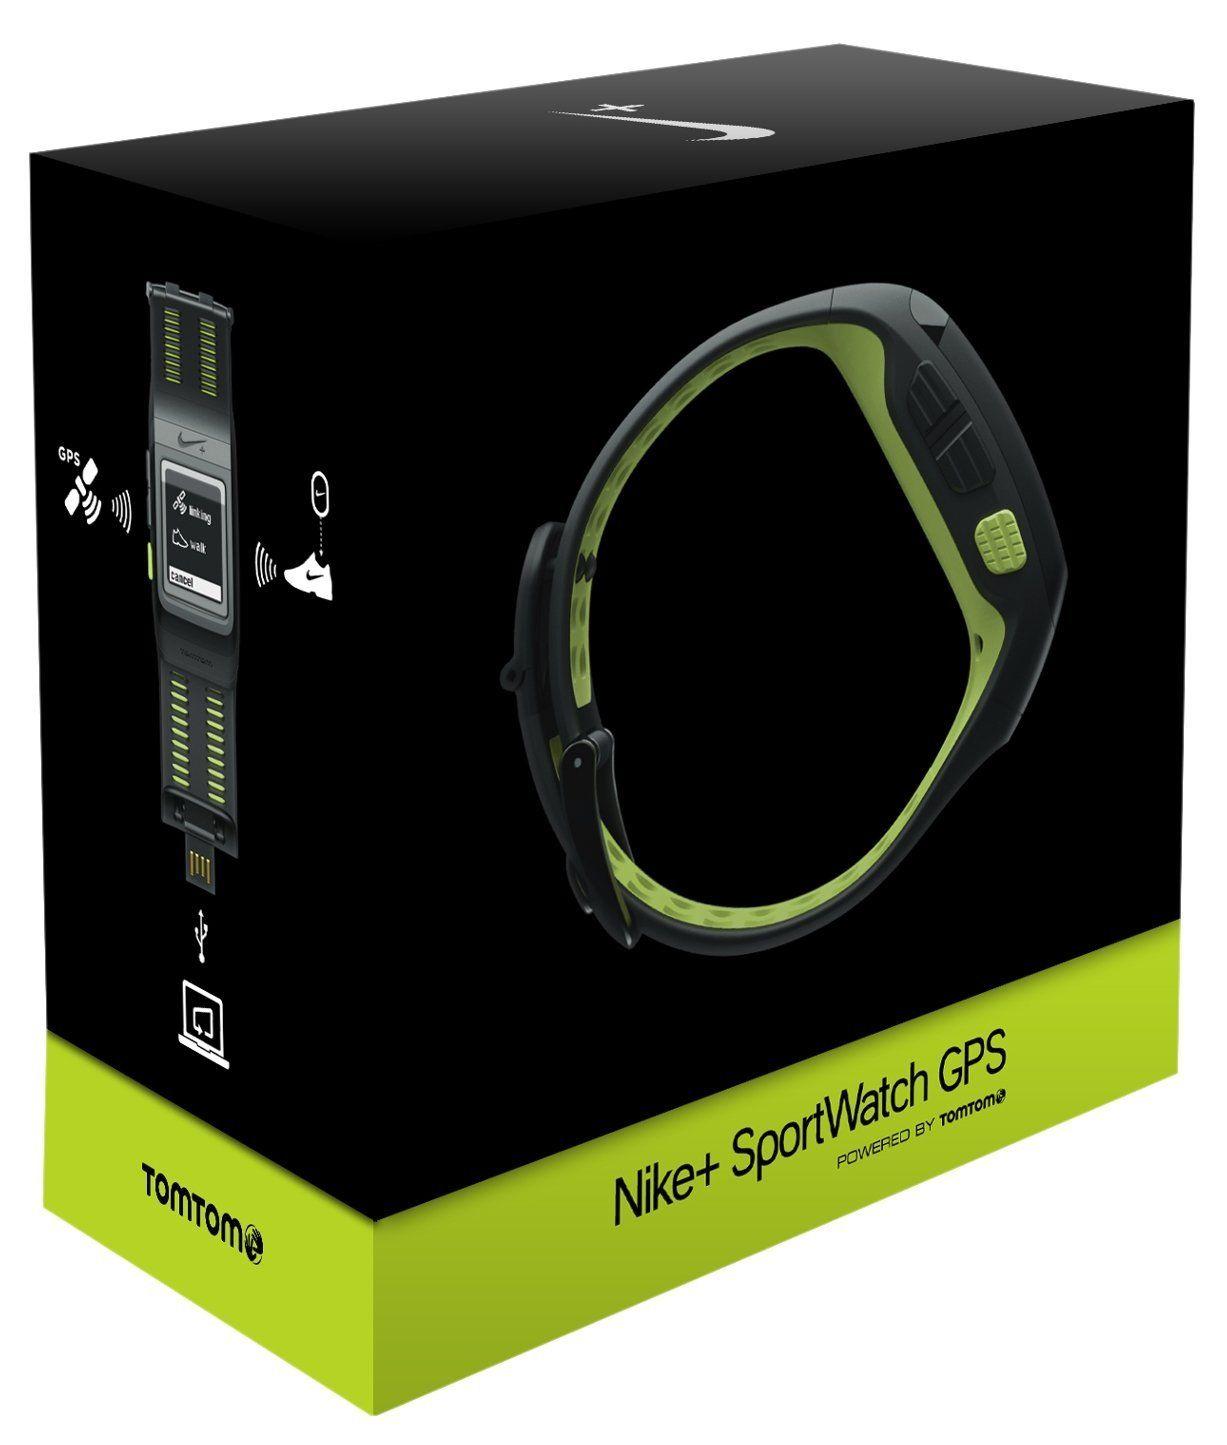 Amazon Com Nike Sportwatch Gps Powered By Tomtom Black Volt Gps Navigation Gps Gps Navigation Gps Units